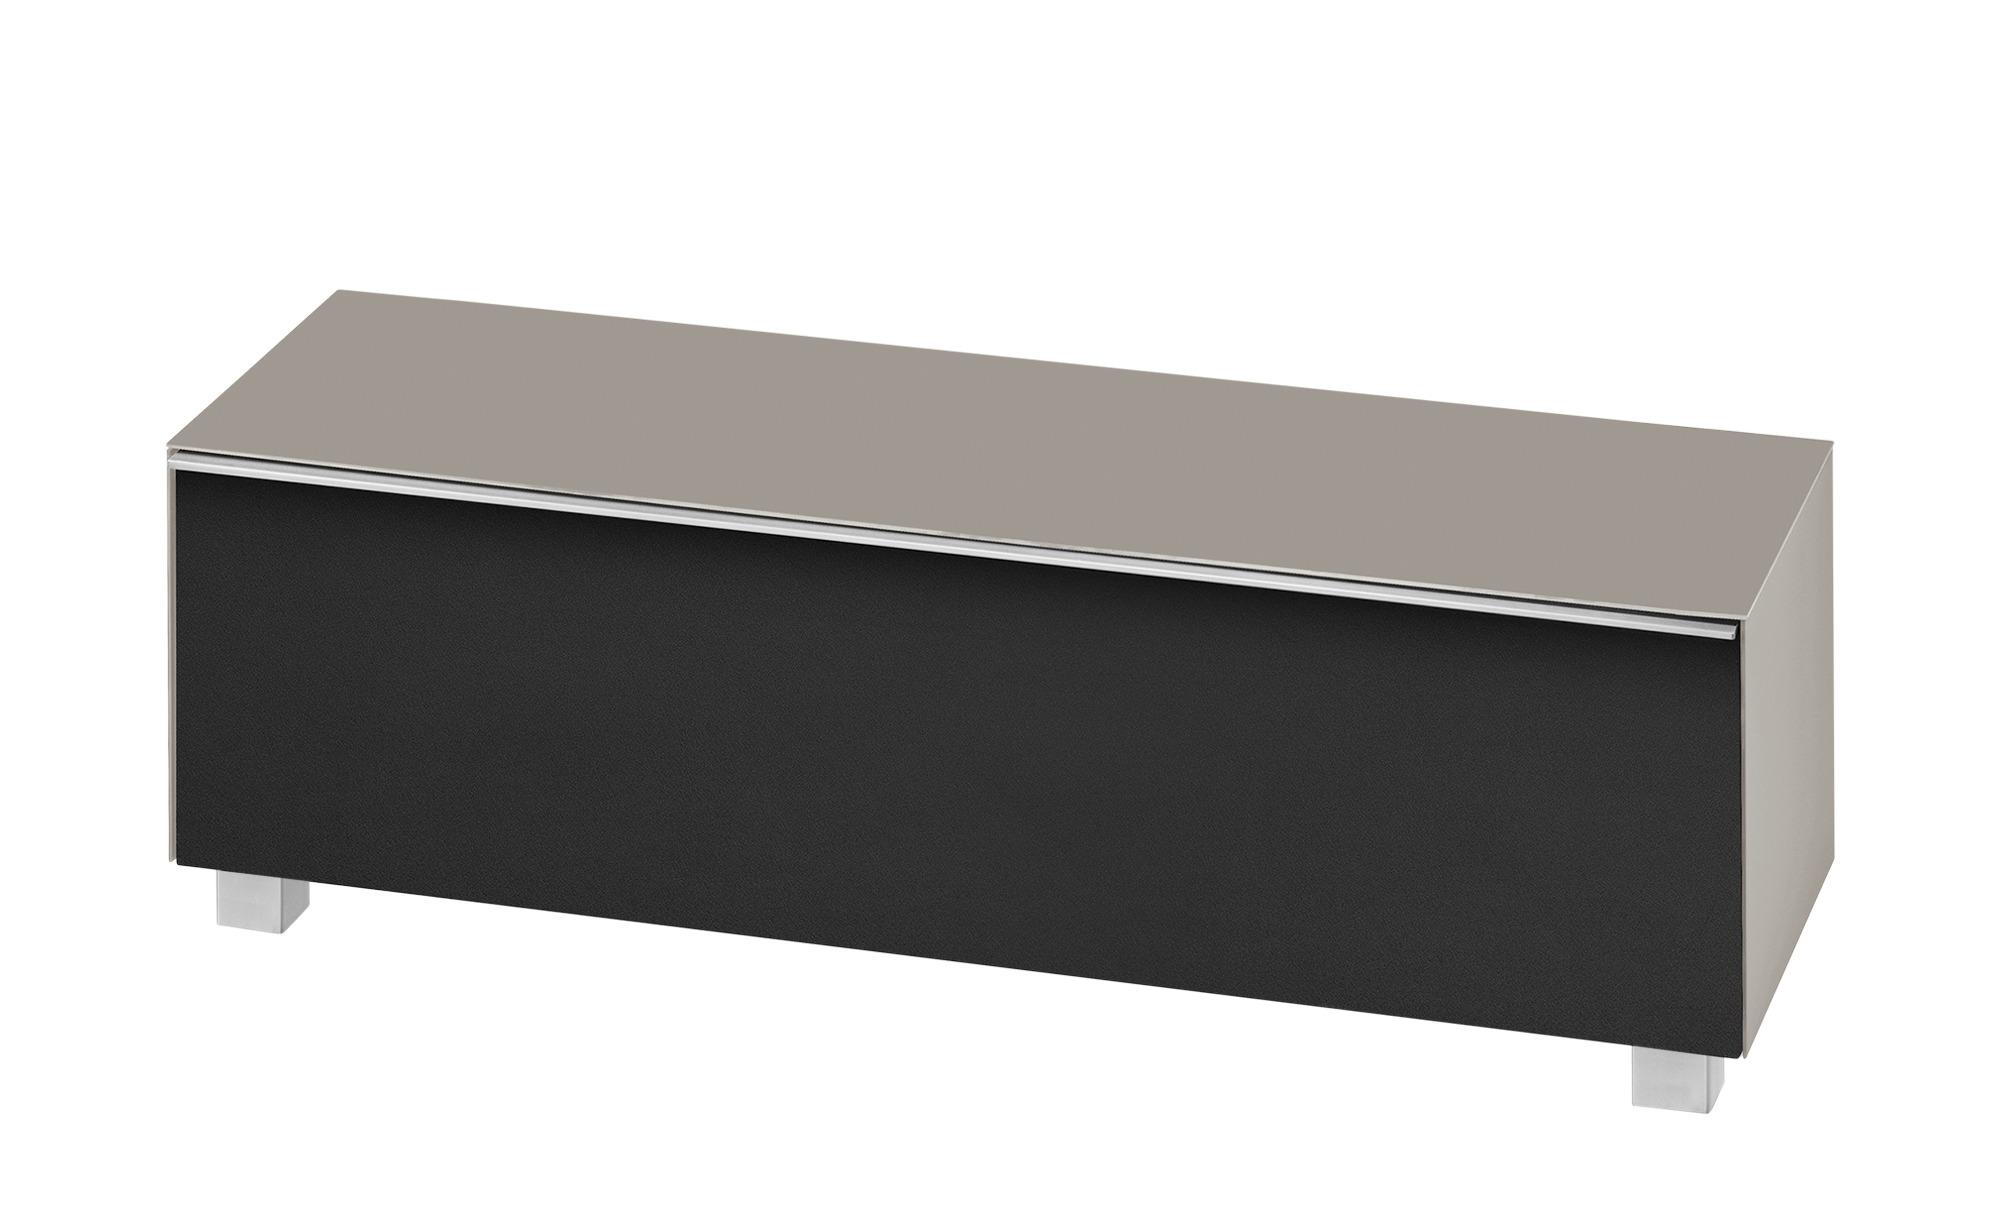 Lowboard  Soundbase S ¦ braun ¦ Maße (cm): B: 140 H: 43 T: 42 Kommoden & Sideboards > Lowboards - Höffner